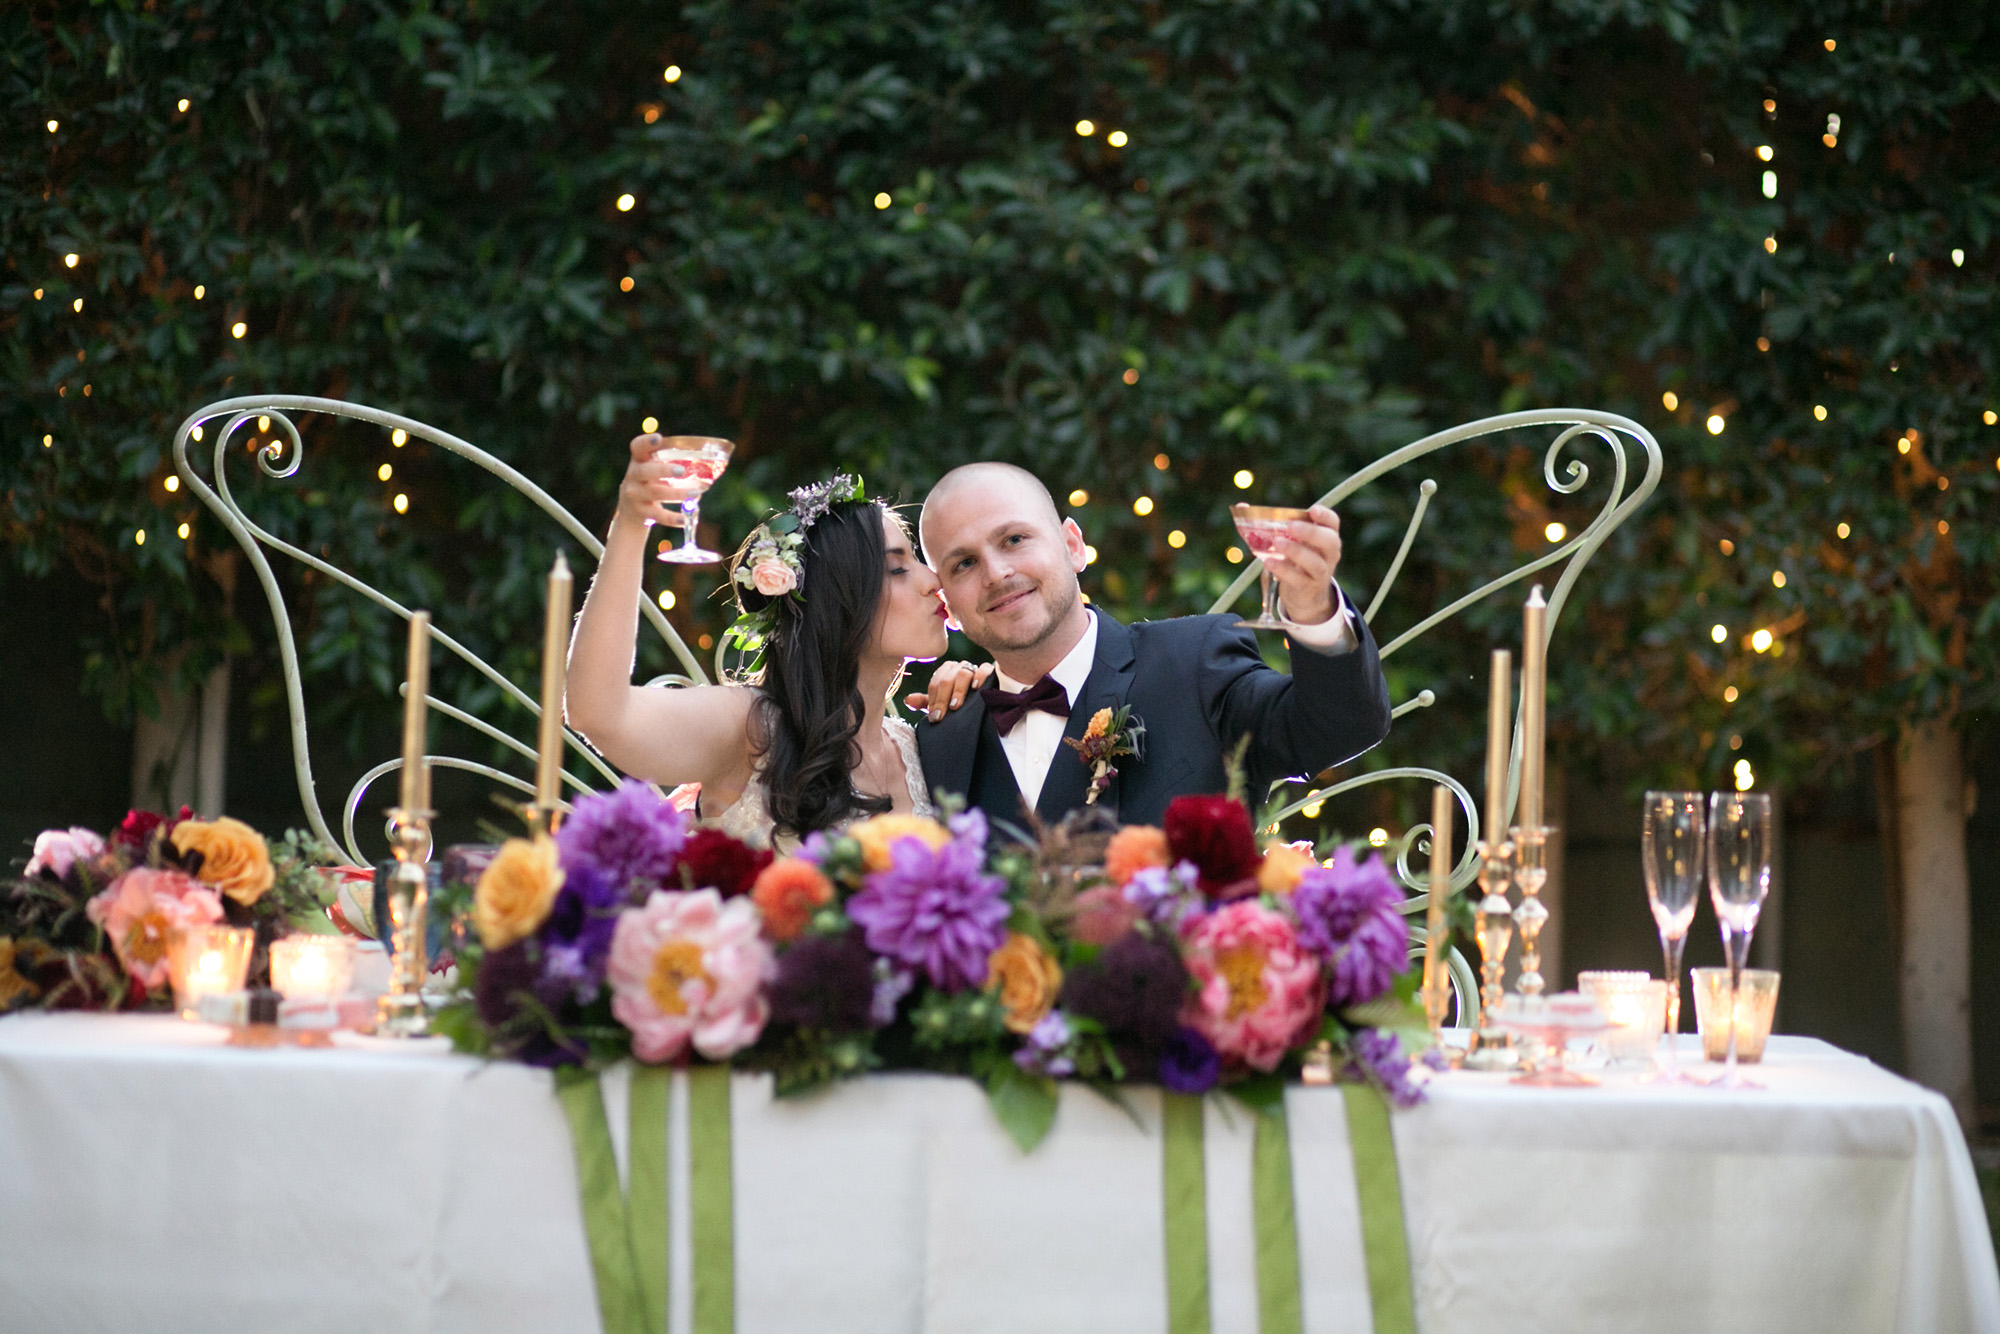 christmas-house-weddings-receptions-carrie-vines-165.jpg